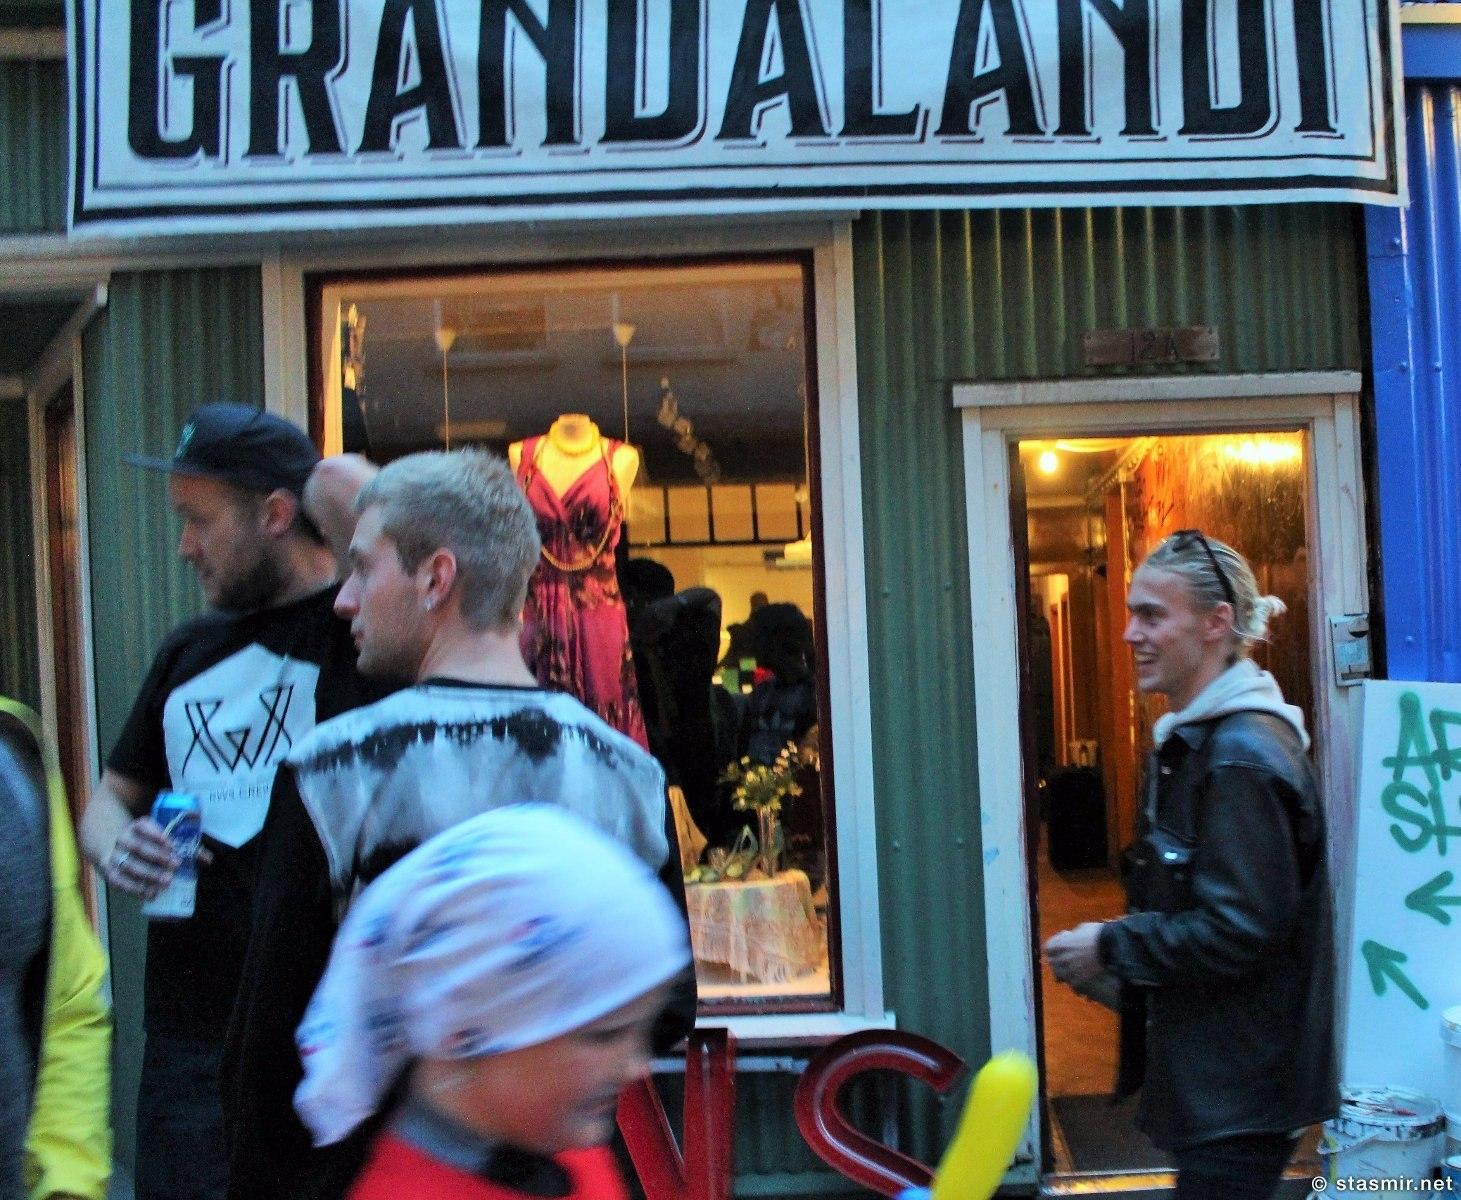 Streets of Reykjavik, Photo Stasmir, фото Стасмир